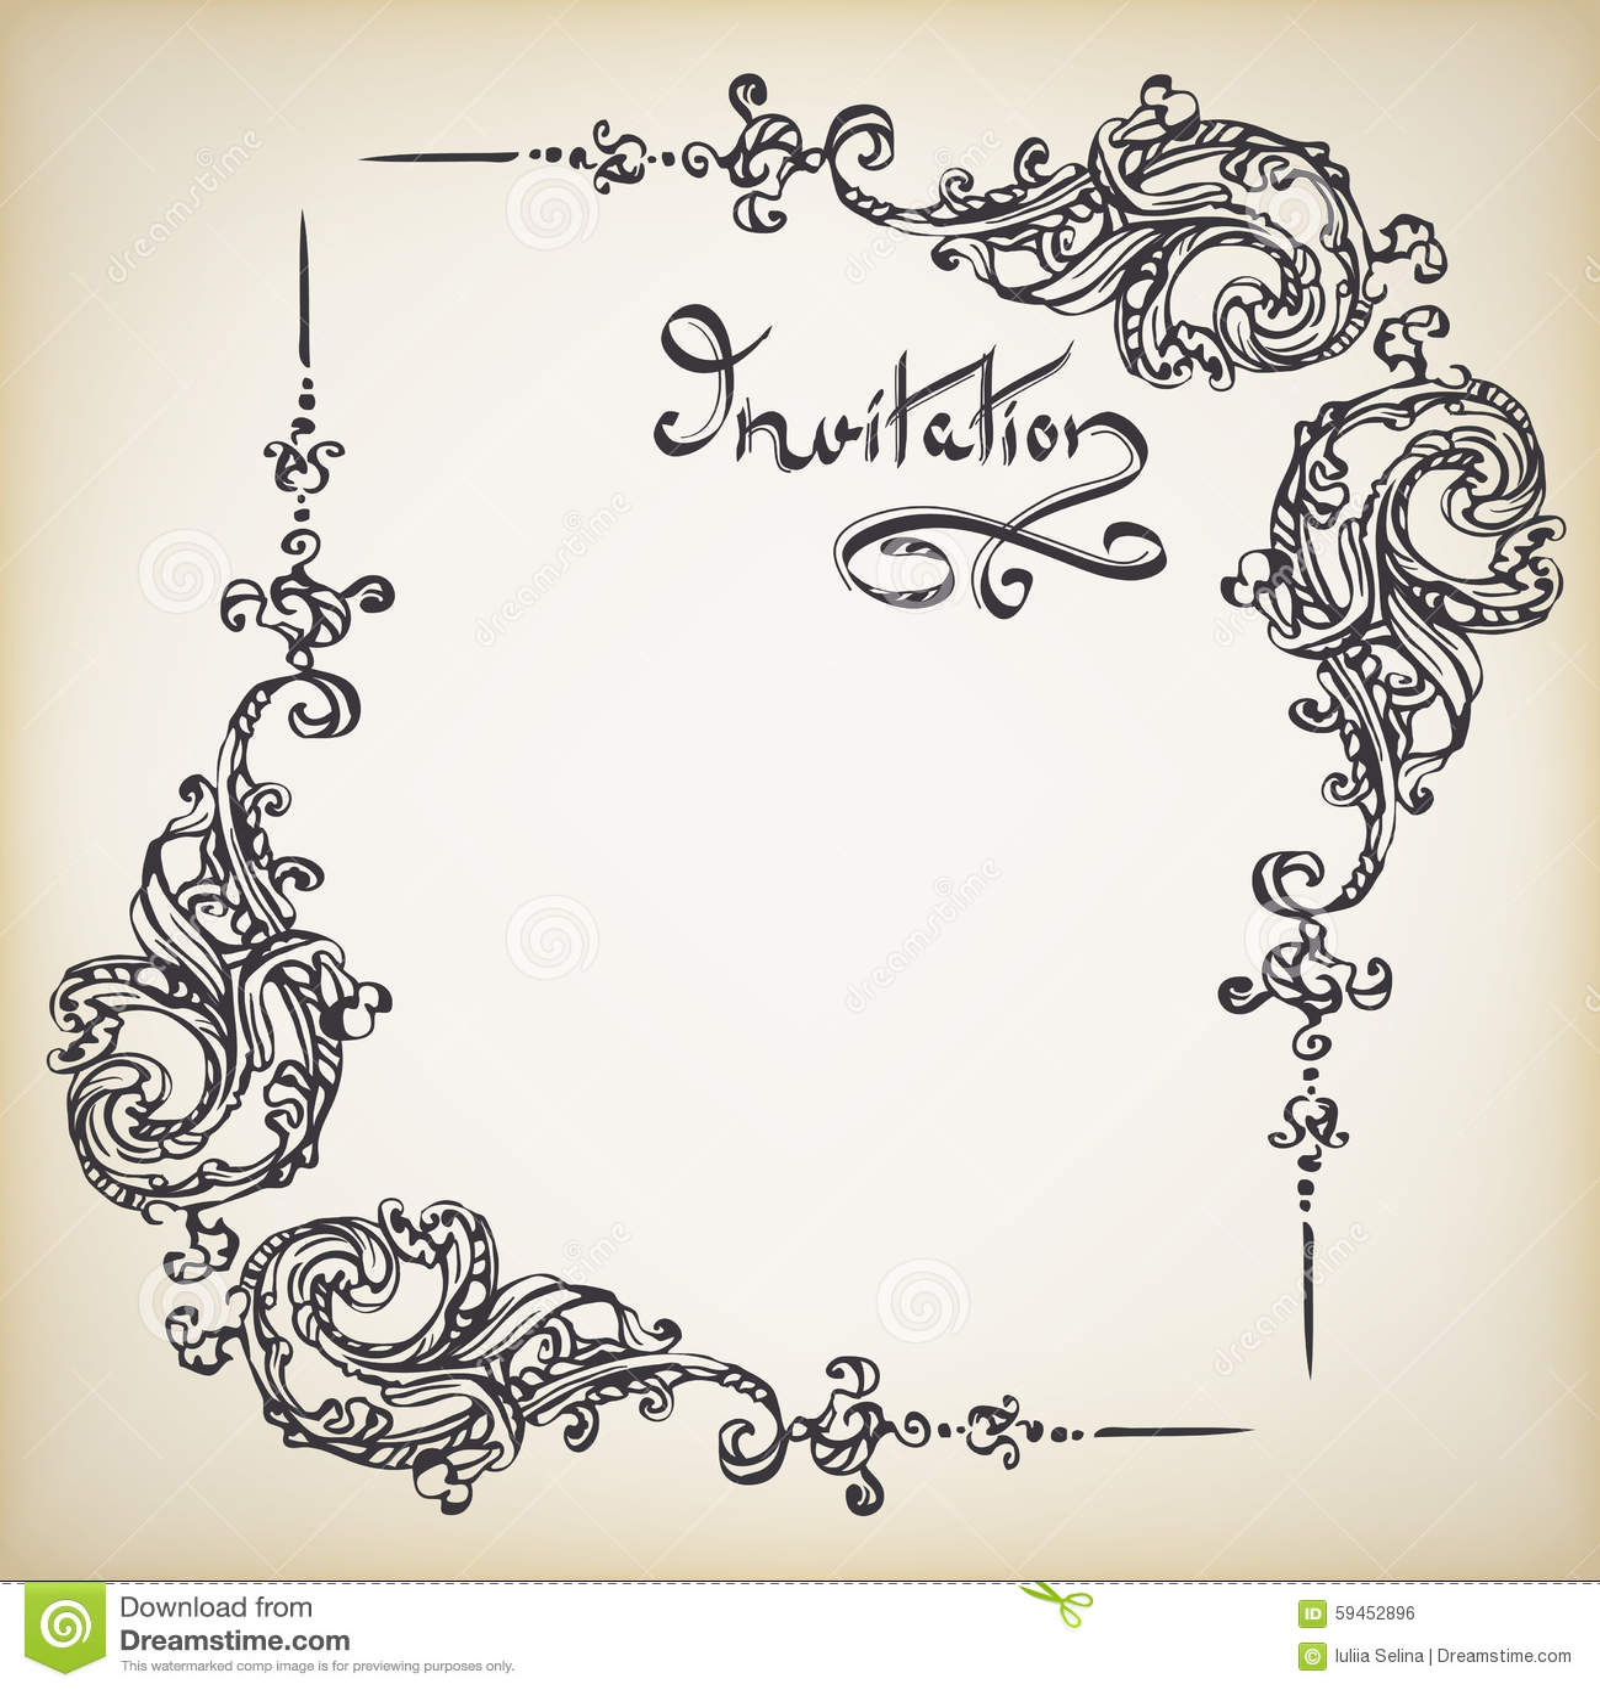 Handwritten Wedding Invitation is perfect invitations design